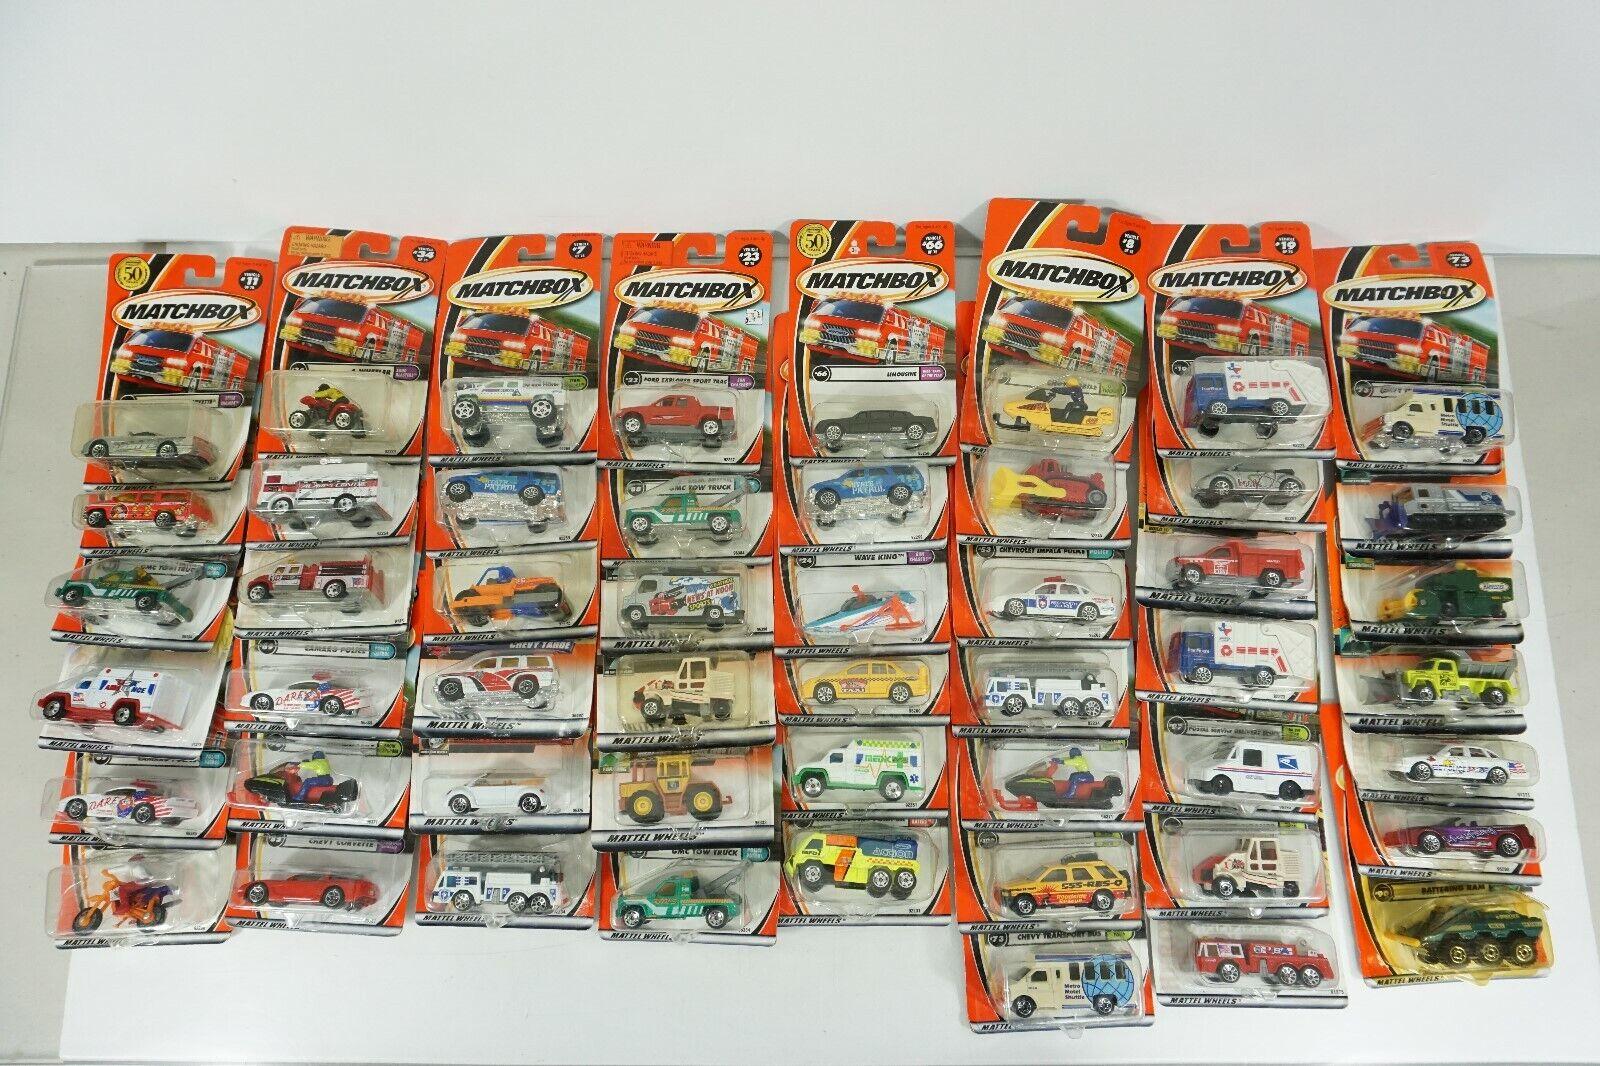 Matchbox Die Cast Huge Lot of 63 Cars - Postal Service Snowmobile TV News Paver